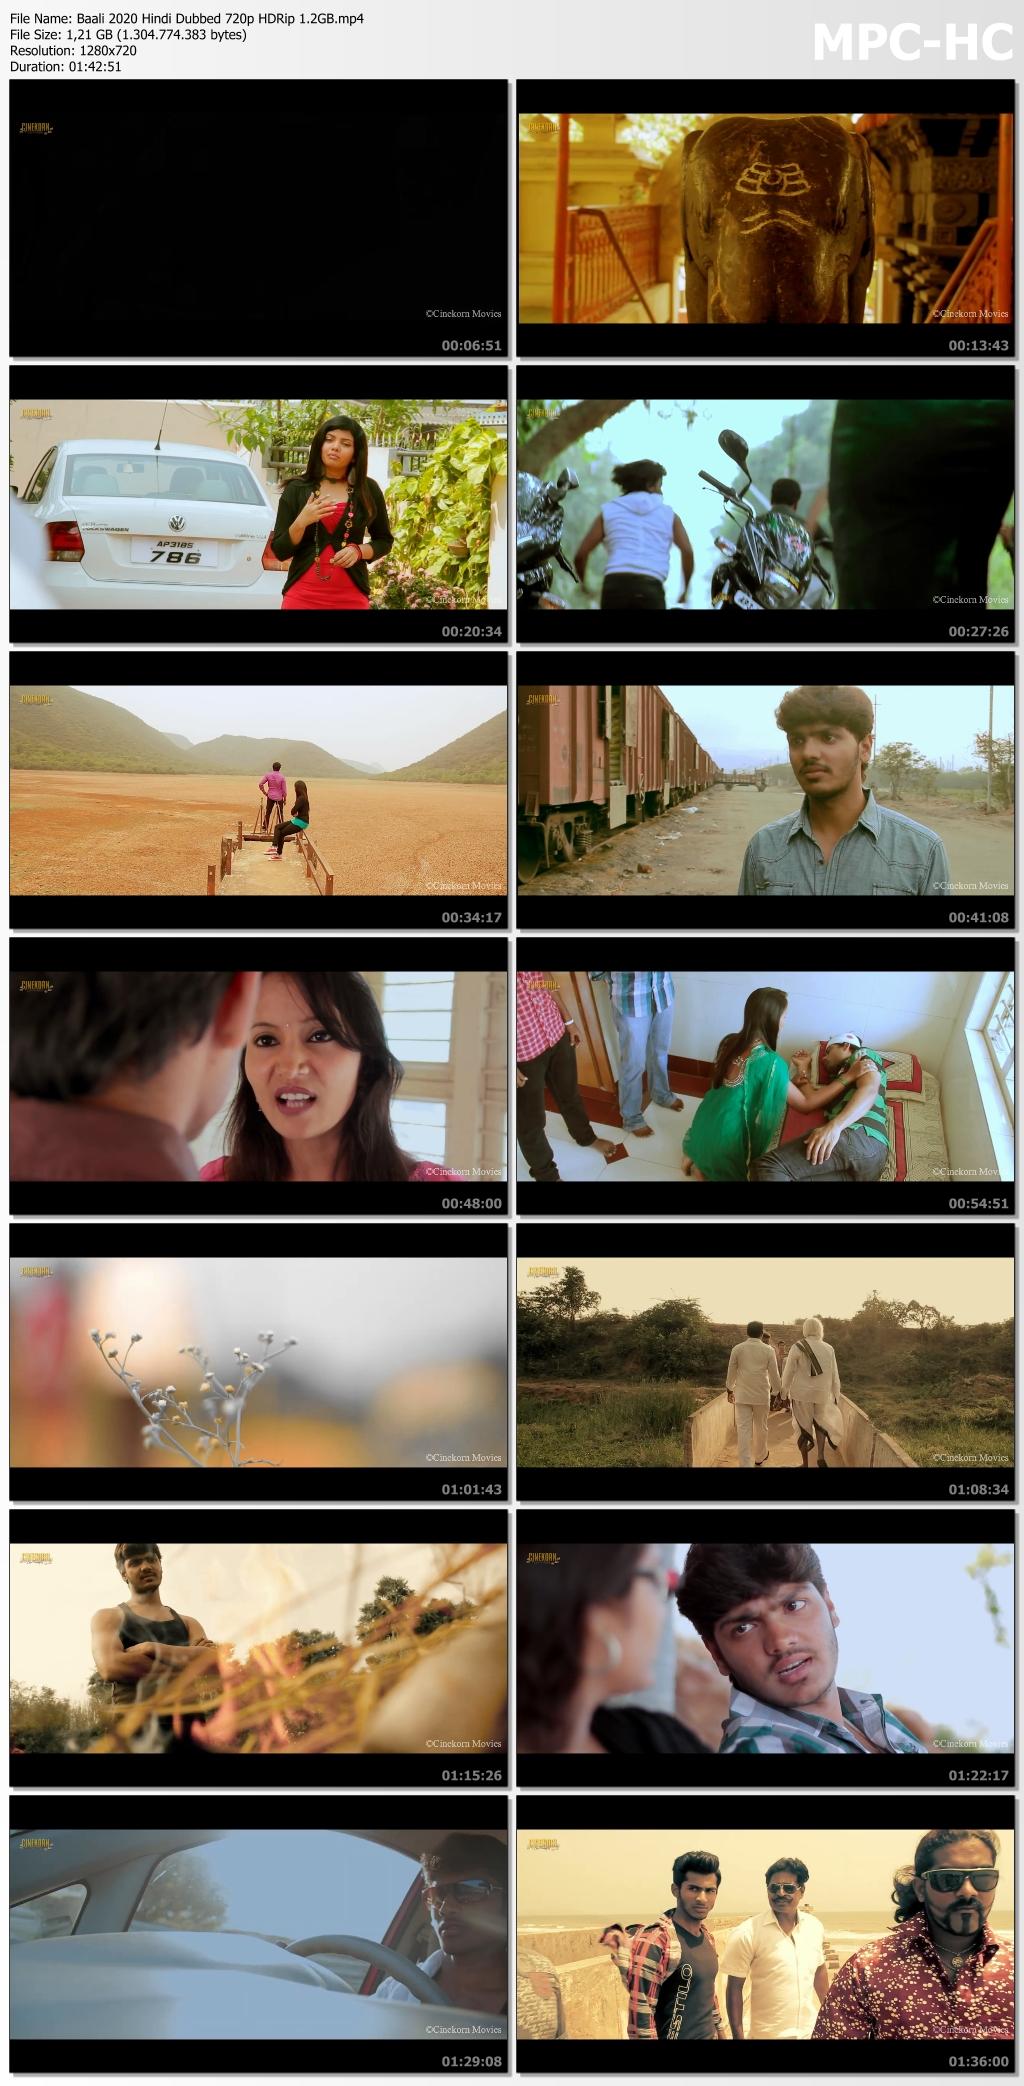 Baali-2020-Hindi-Dubbed-720p-HDRip-1-2-GB-mp4-thumbs